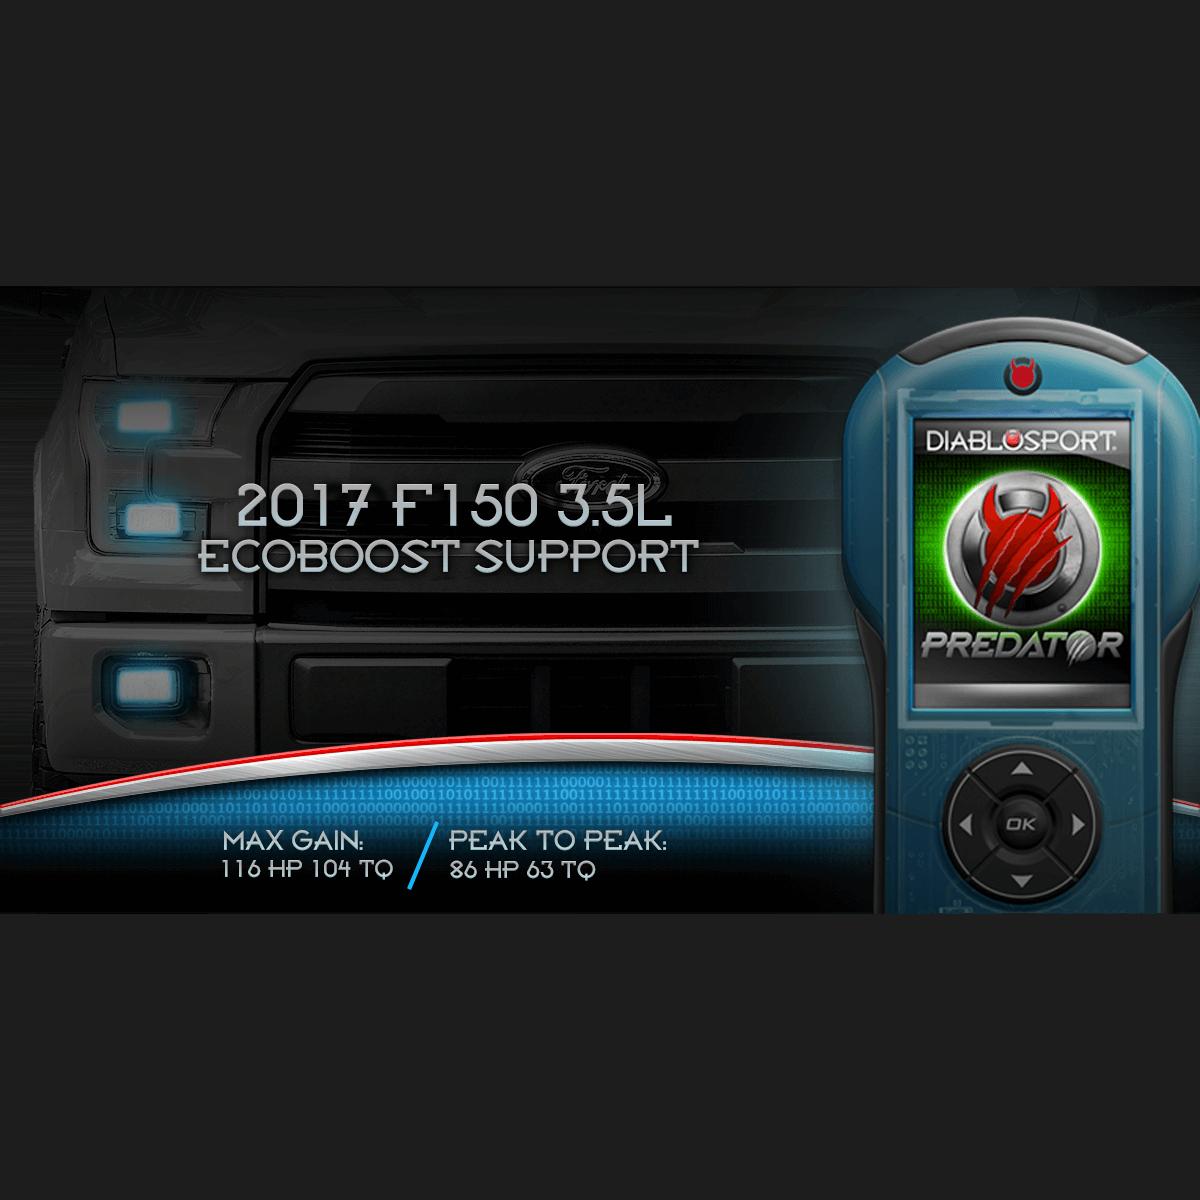 Tuning Top Level Motorsport Diablosport Predator Wiring Diagram Now 2017 F150 35l Ecoboost